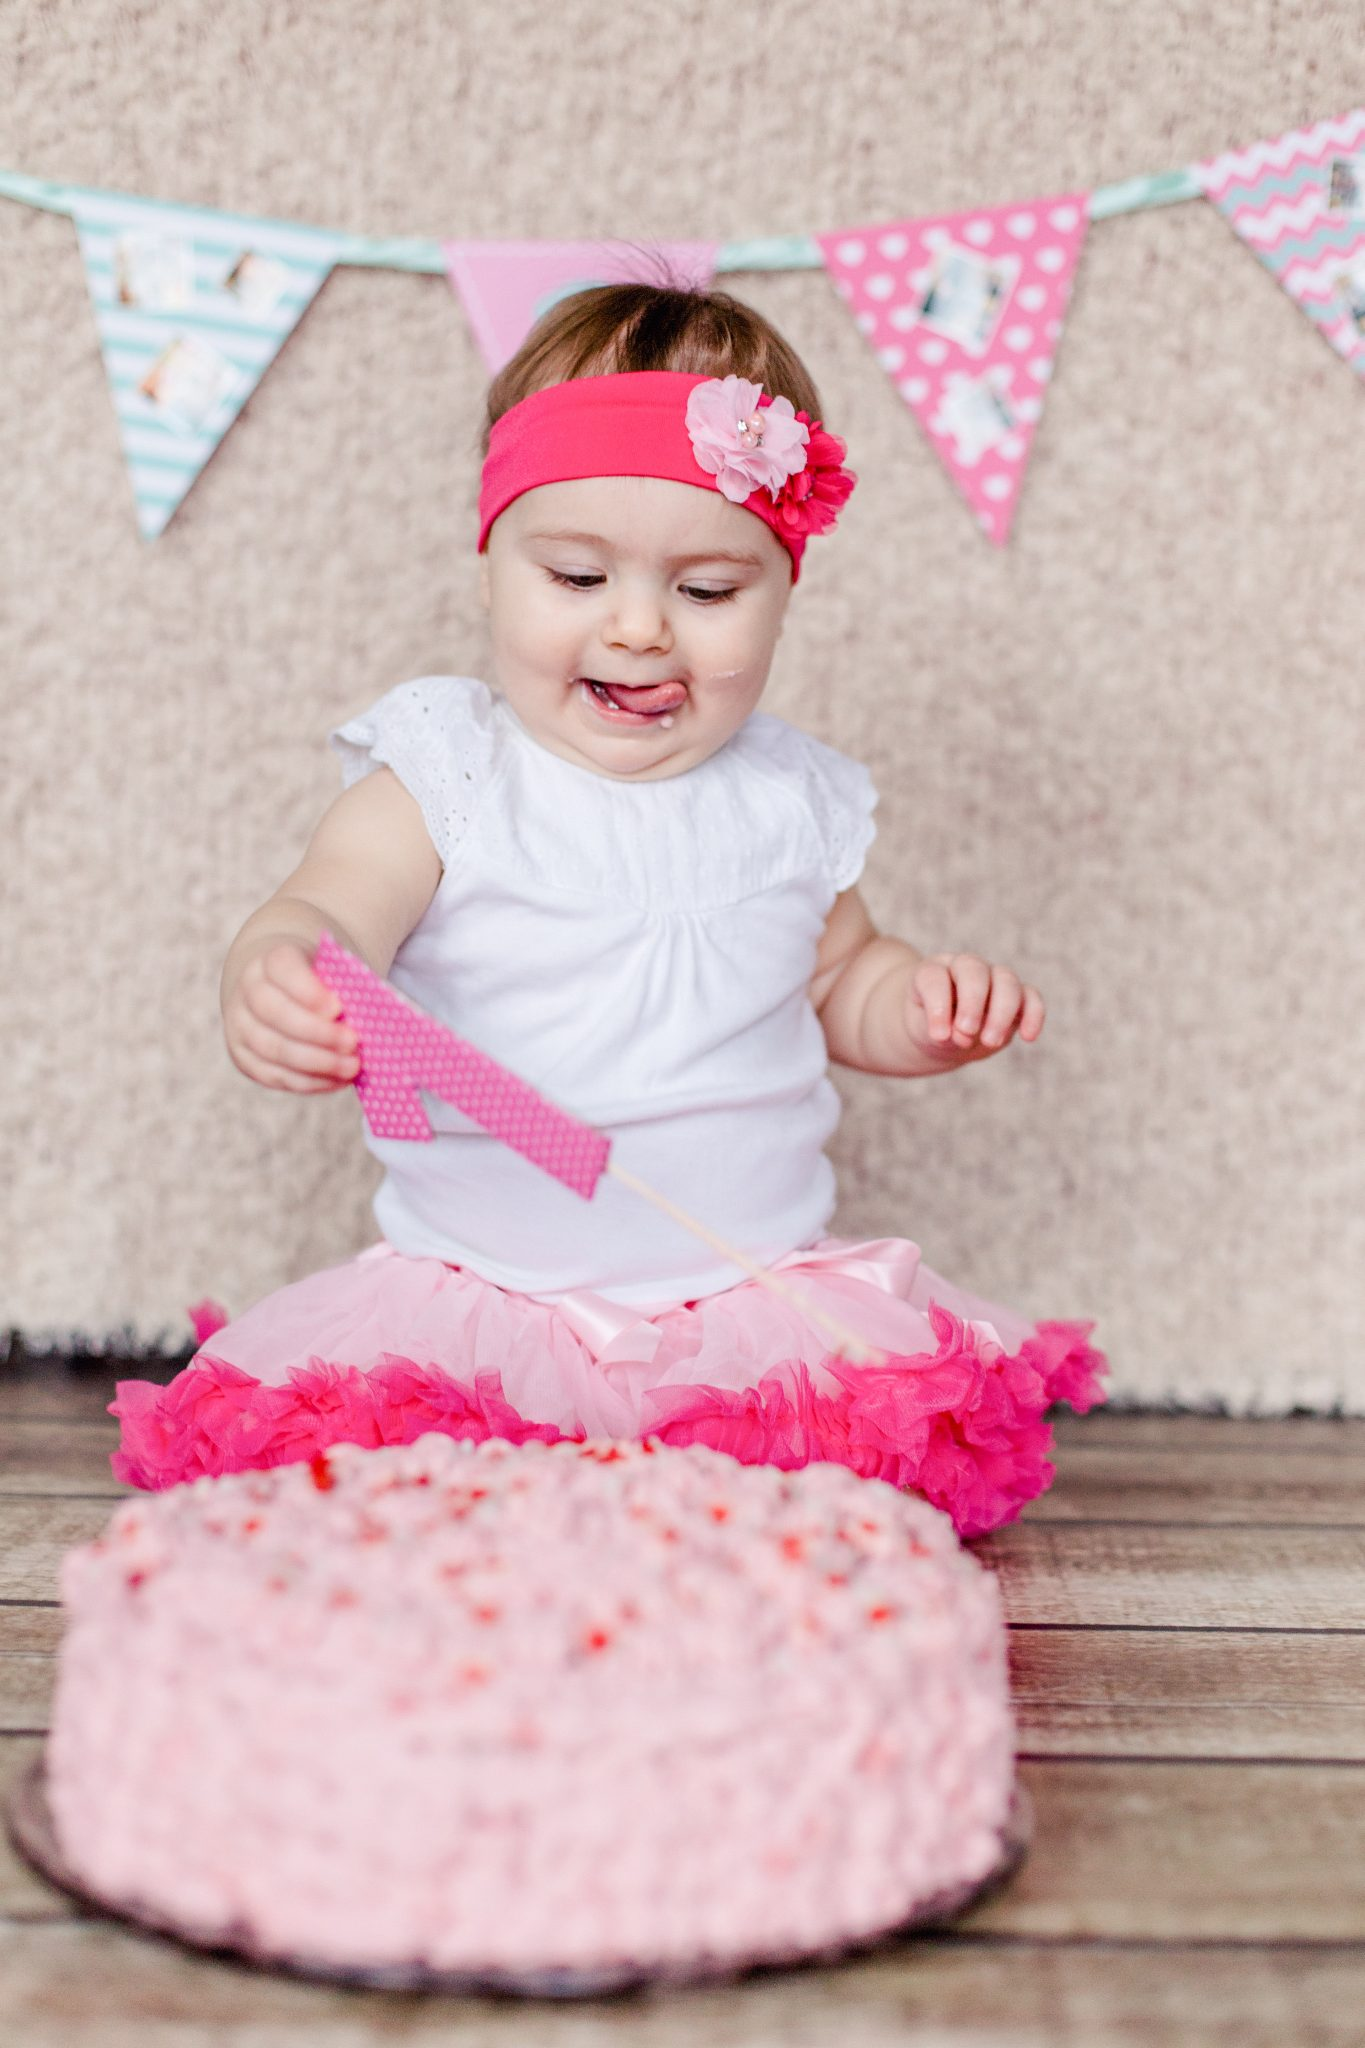 Outfit für ein Cake smash Shooting